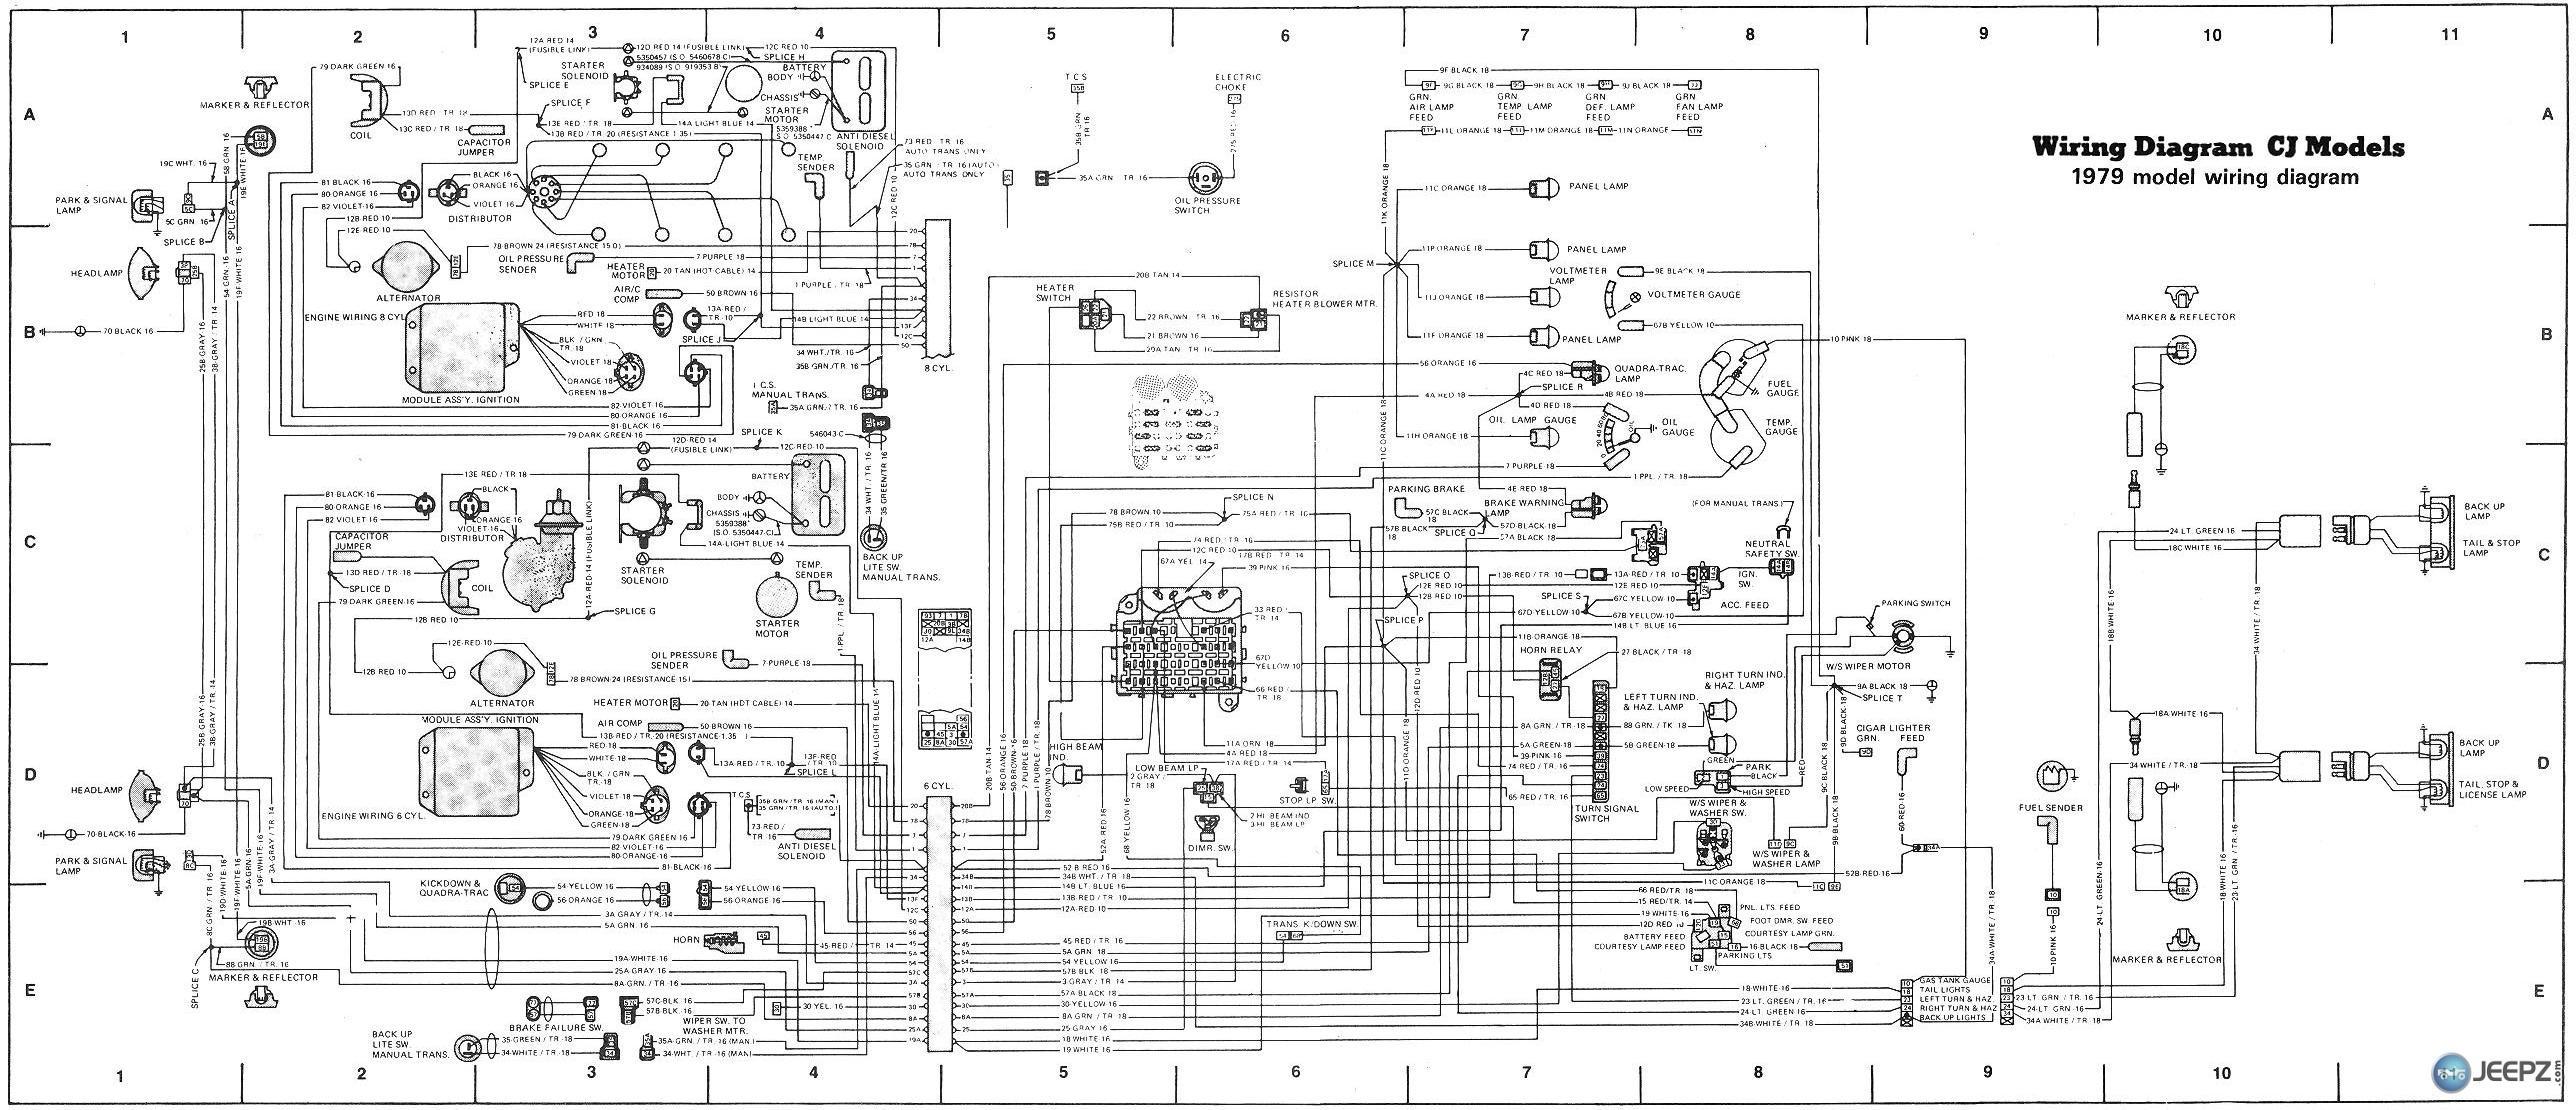 Jeep Wrangler Jk Wiring Diagram Free Valid Jeep Cj5 Wiring Schematic Wiring Diagram